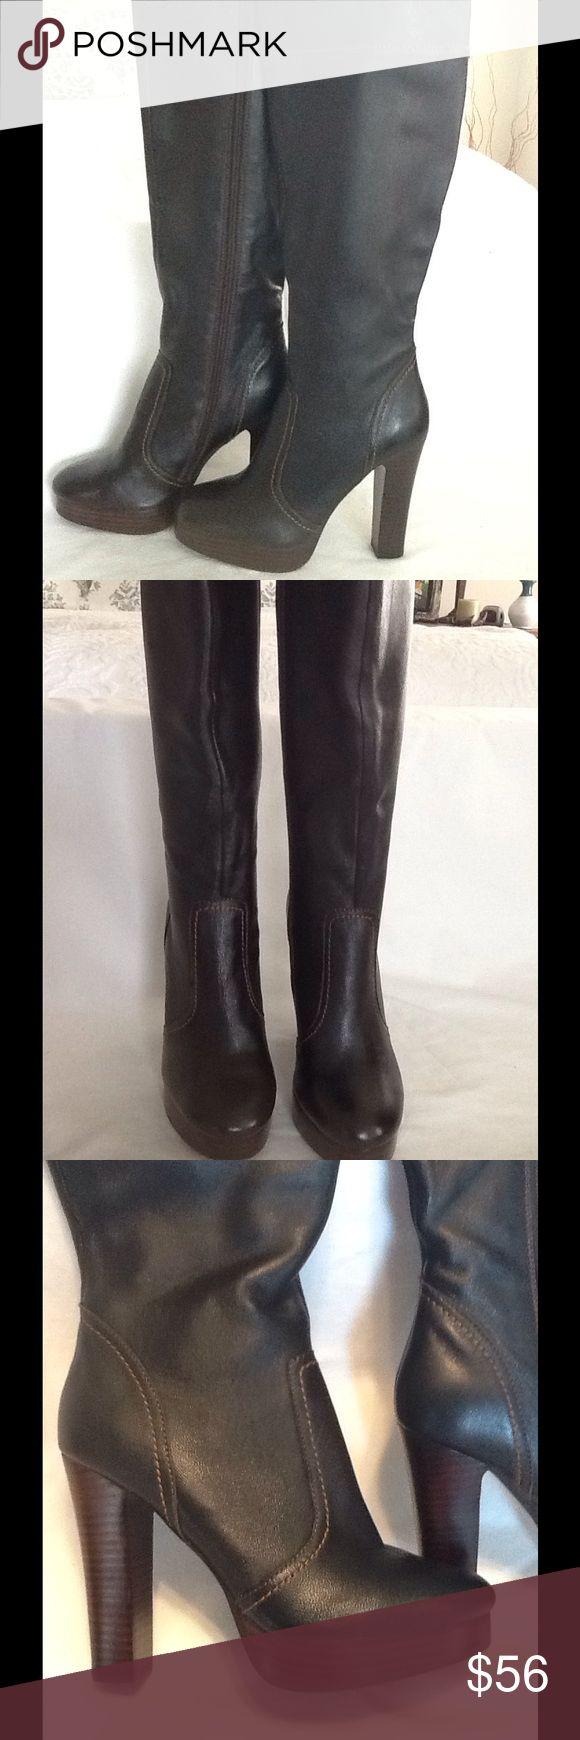 "Colin Stuart dark brown knee high platform boot Featured is a pair of new Colin Stuart dark brown knee high platform boots NWOB.these boots have a 4.5"" heel . Beautiful pair of boots size 5 1/2 B Colin Stuart Shoes Heeled Boots"